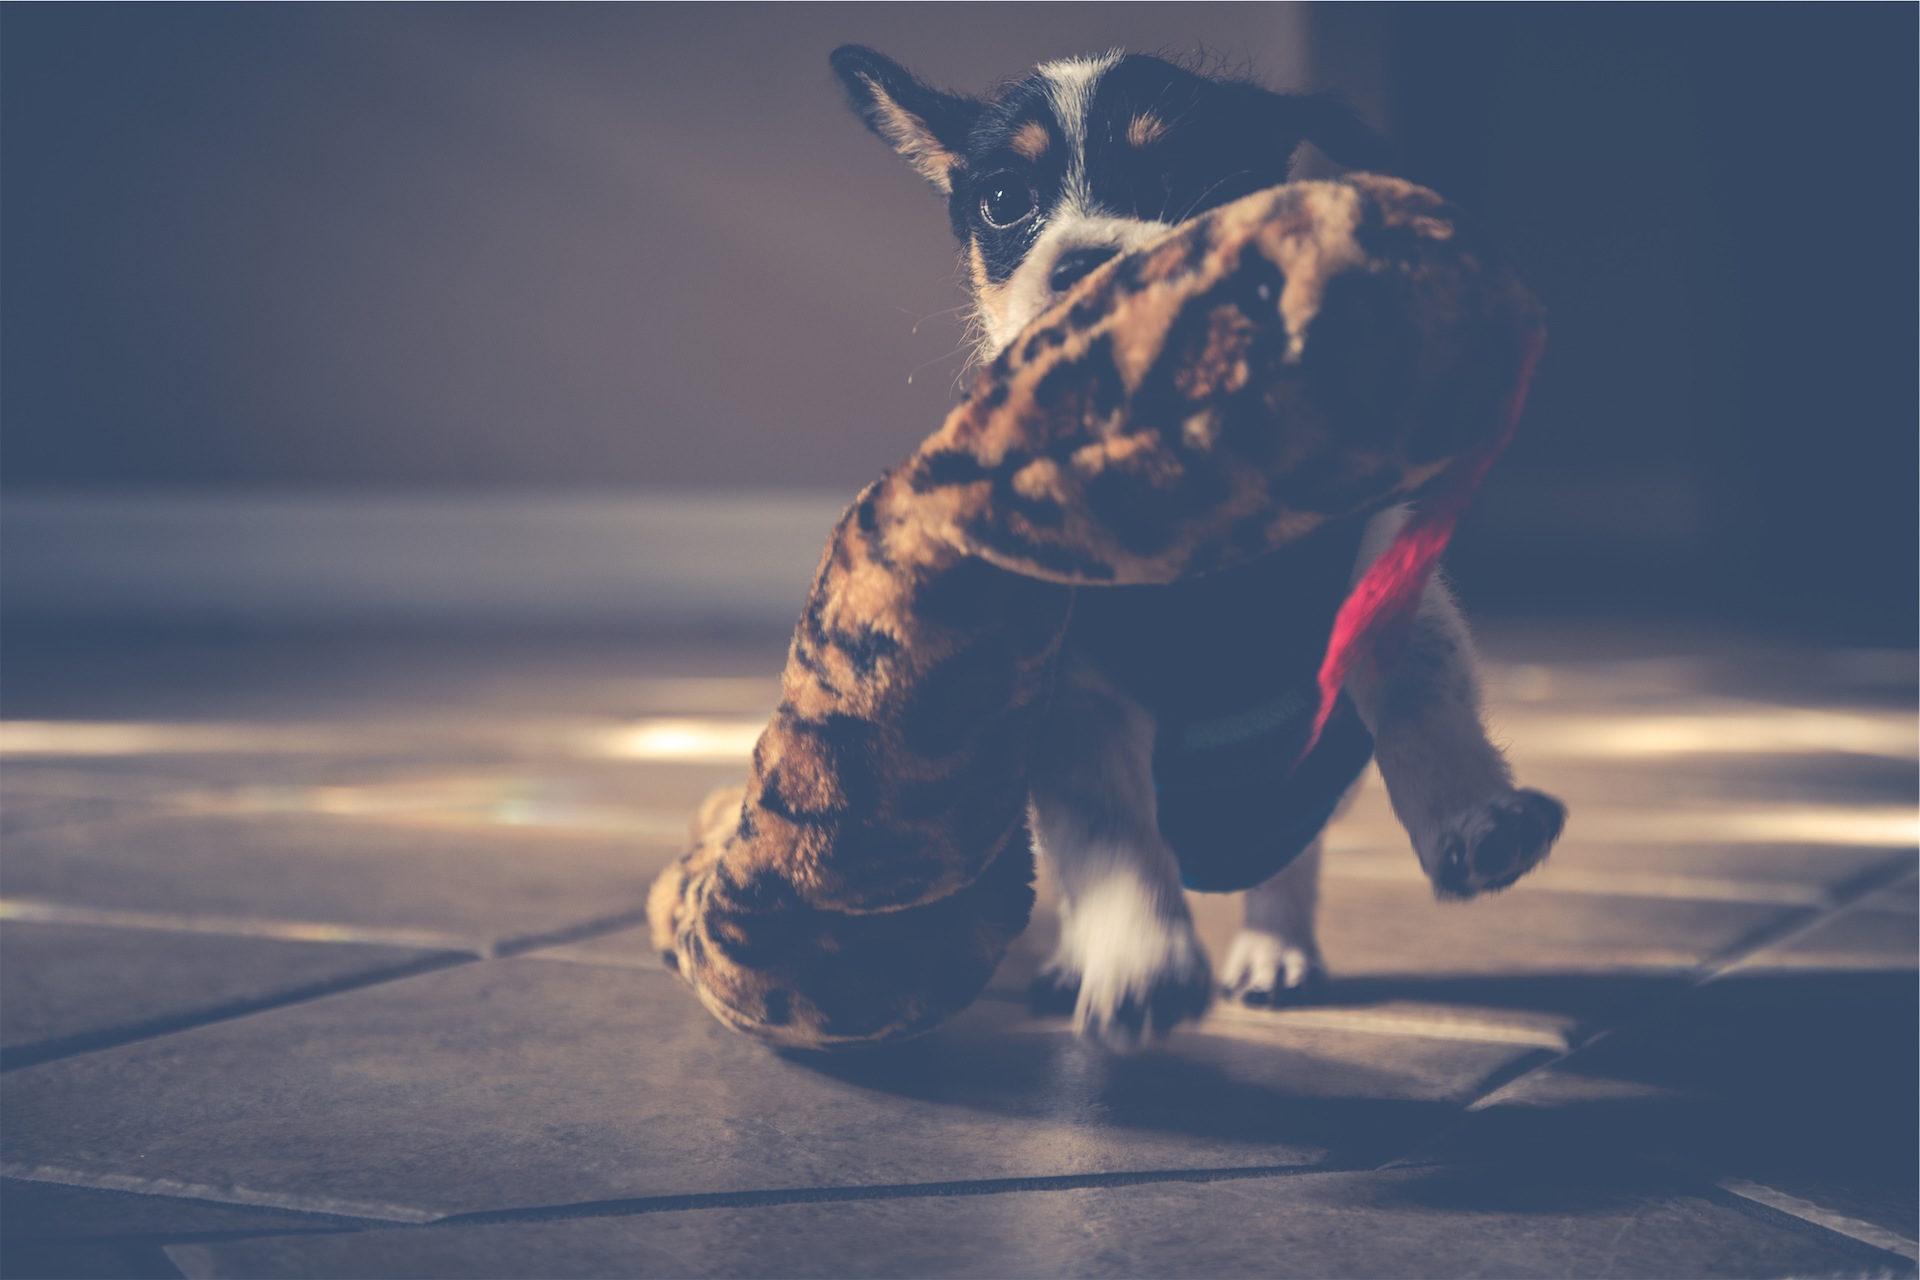 собака, Щенок, Тедди, Монада, игра - Обои HD - Профессор falken.com